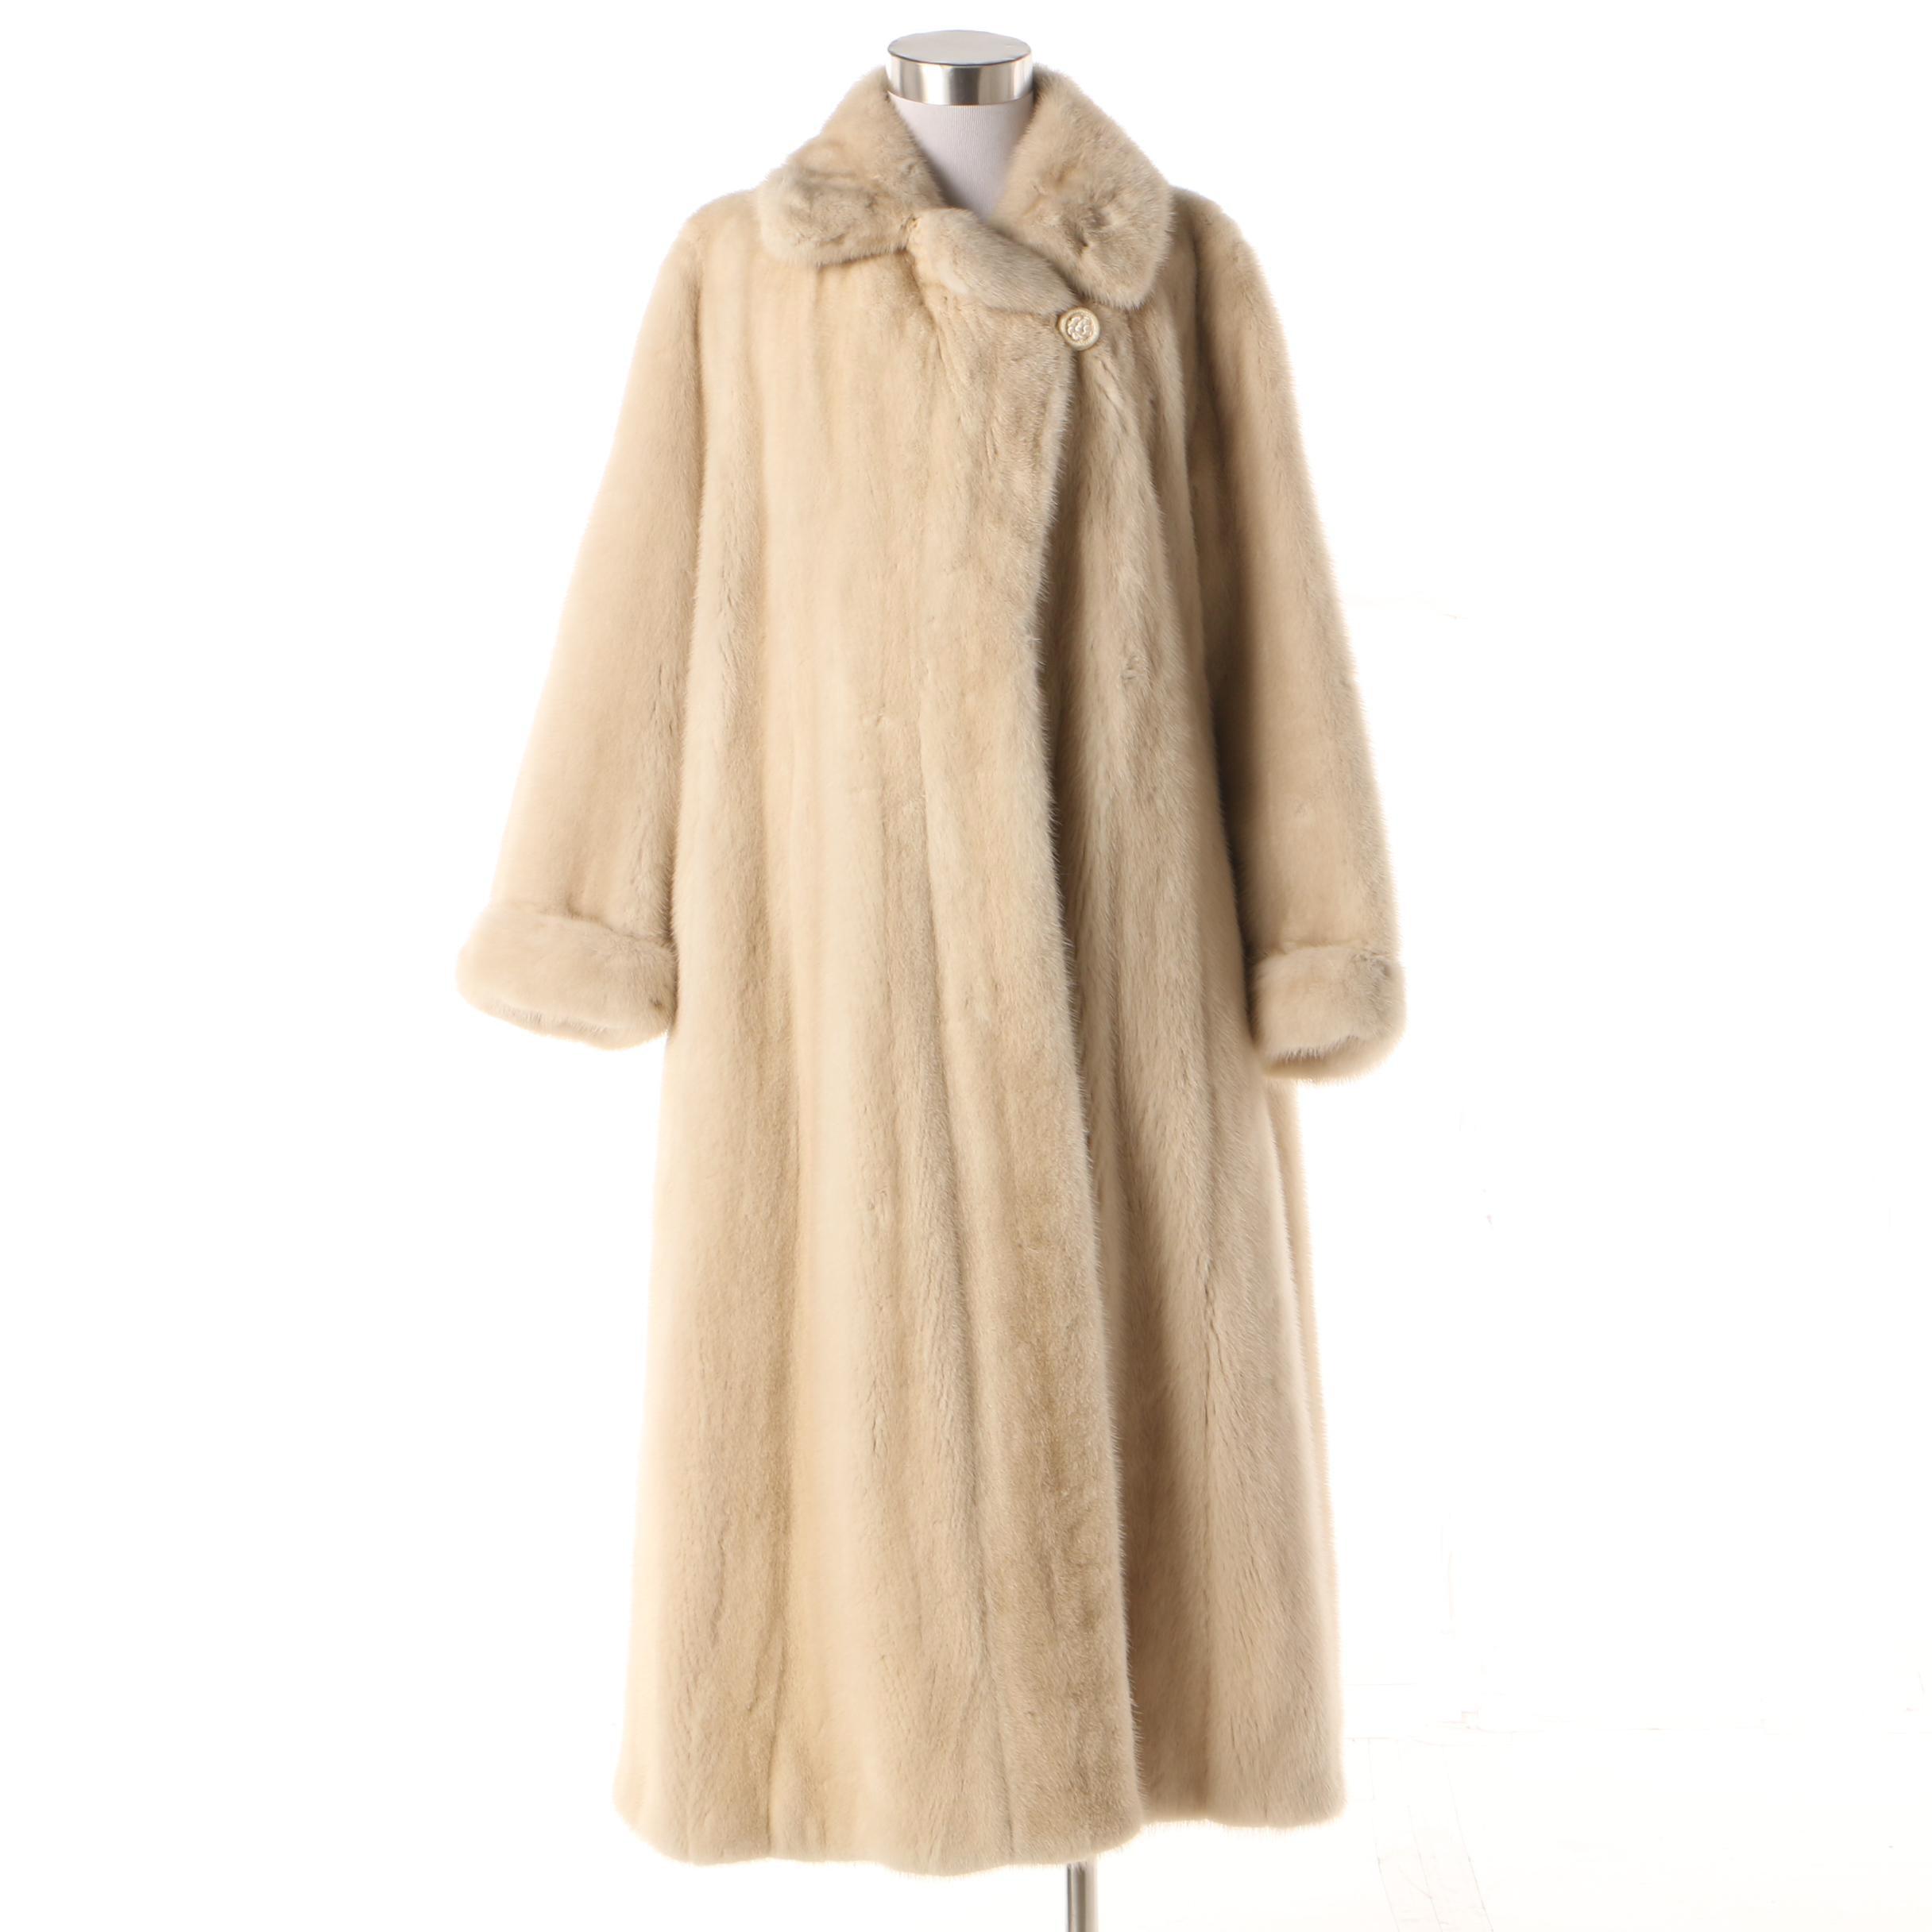 Women's Vintage Blonde Mink Fur A-Line Coat